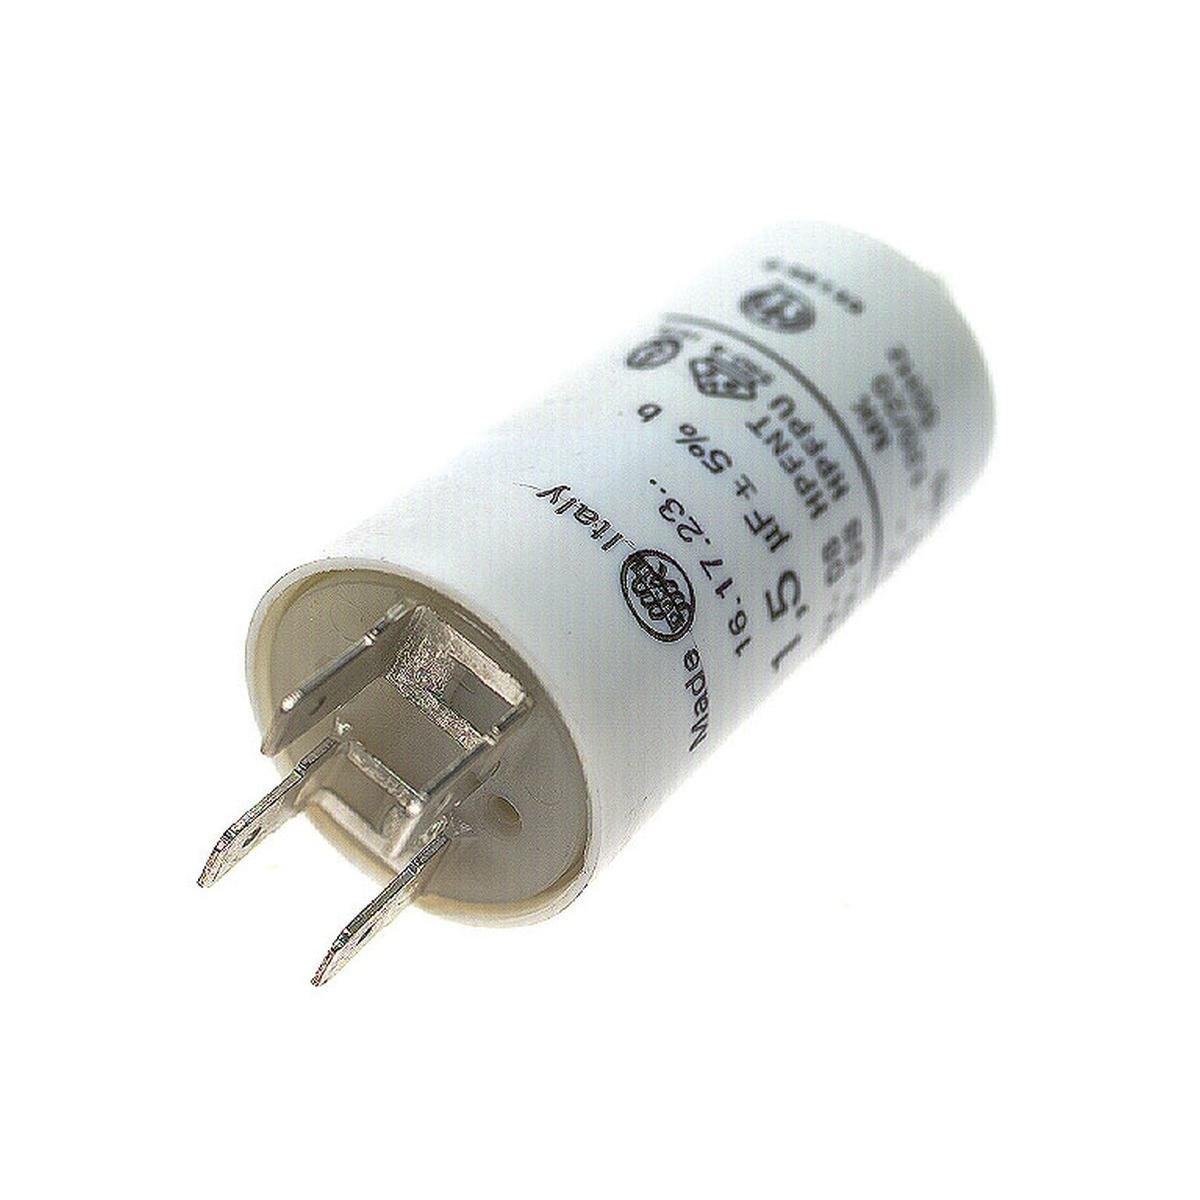 Kondensator 10,0 µF 450V